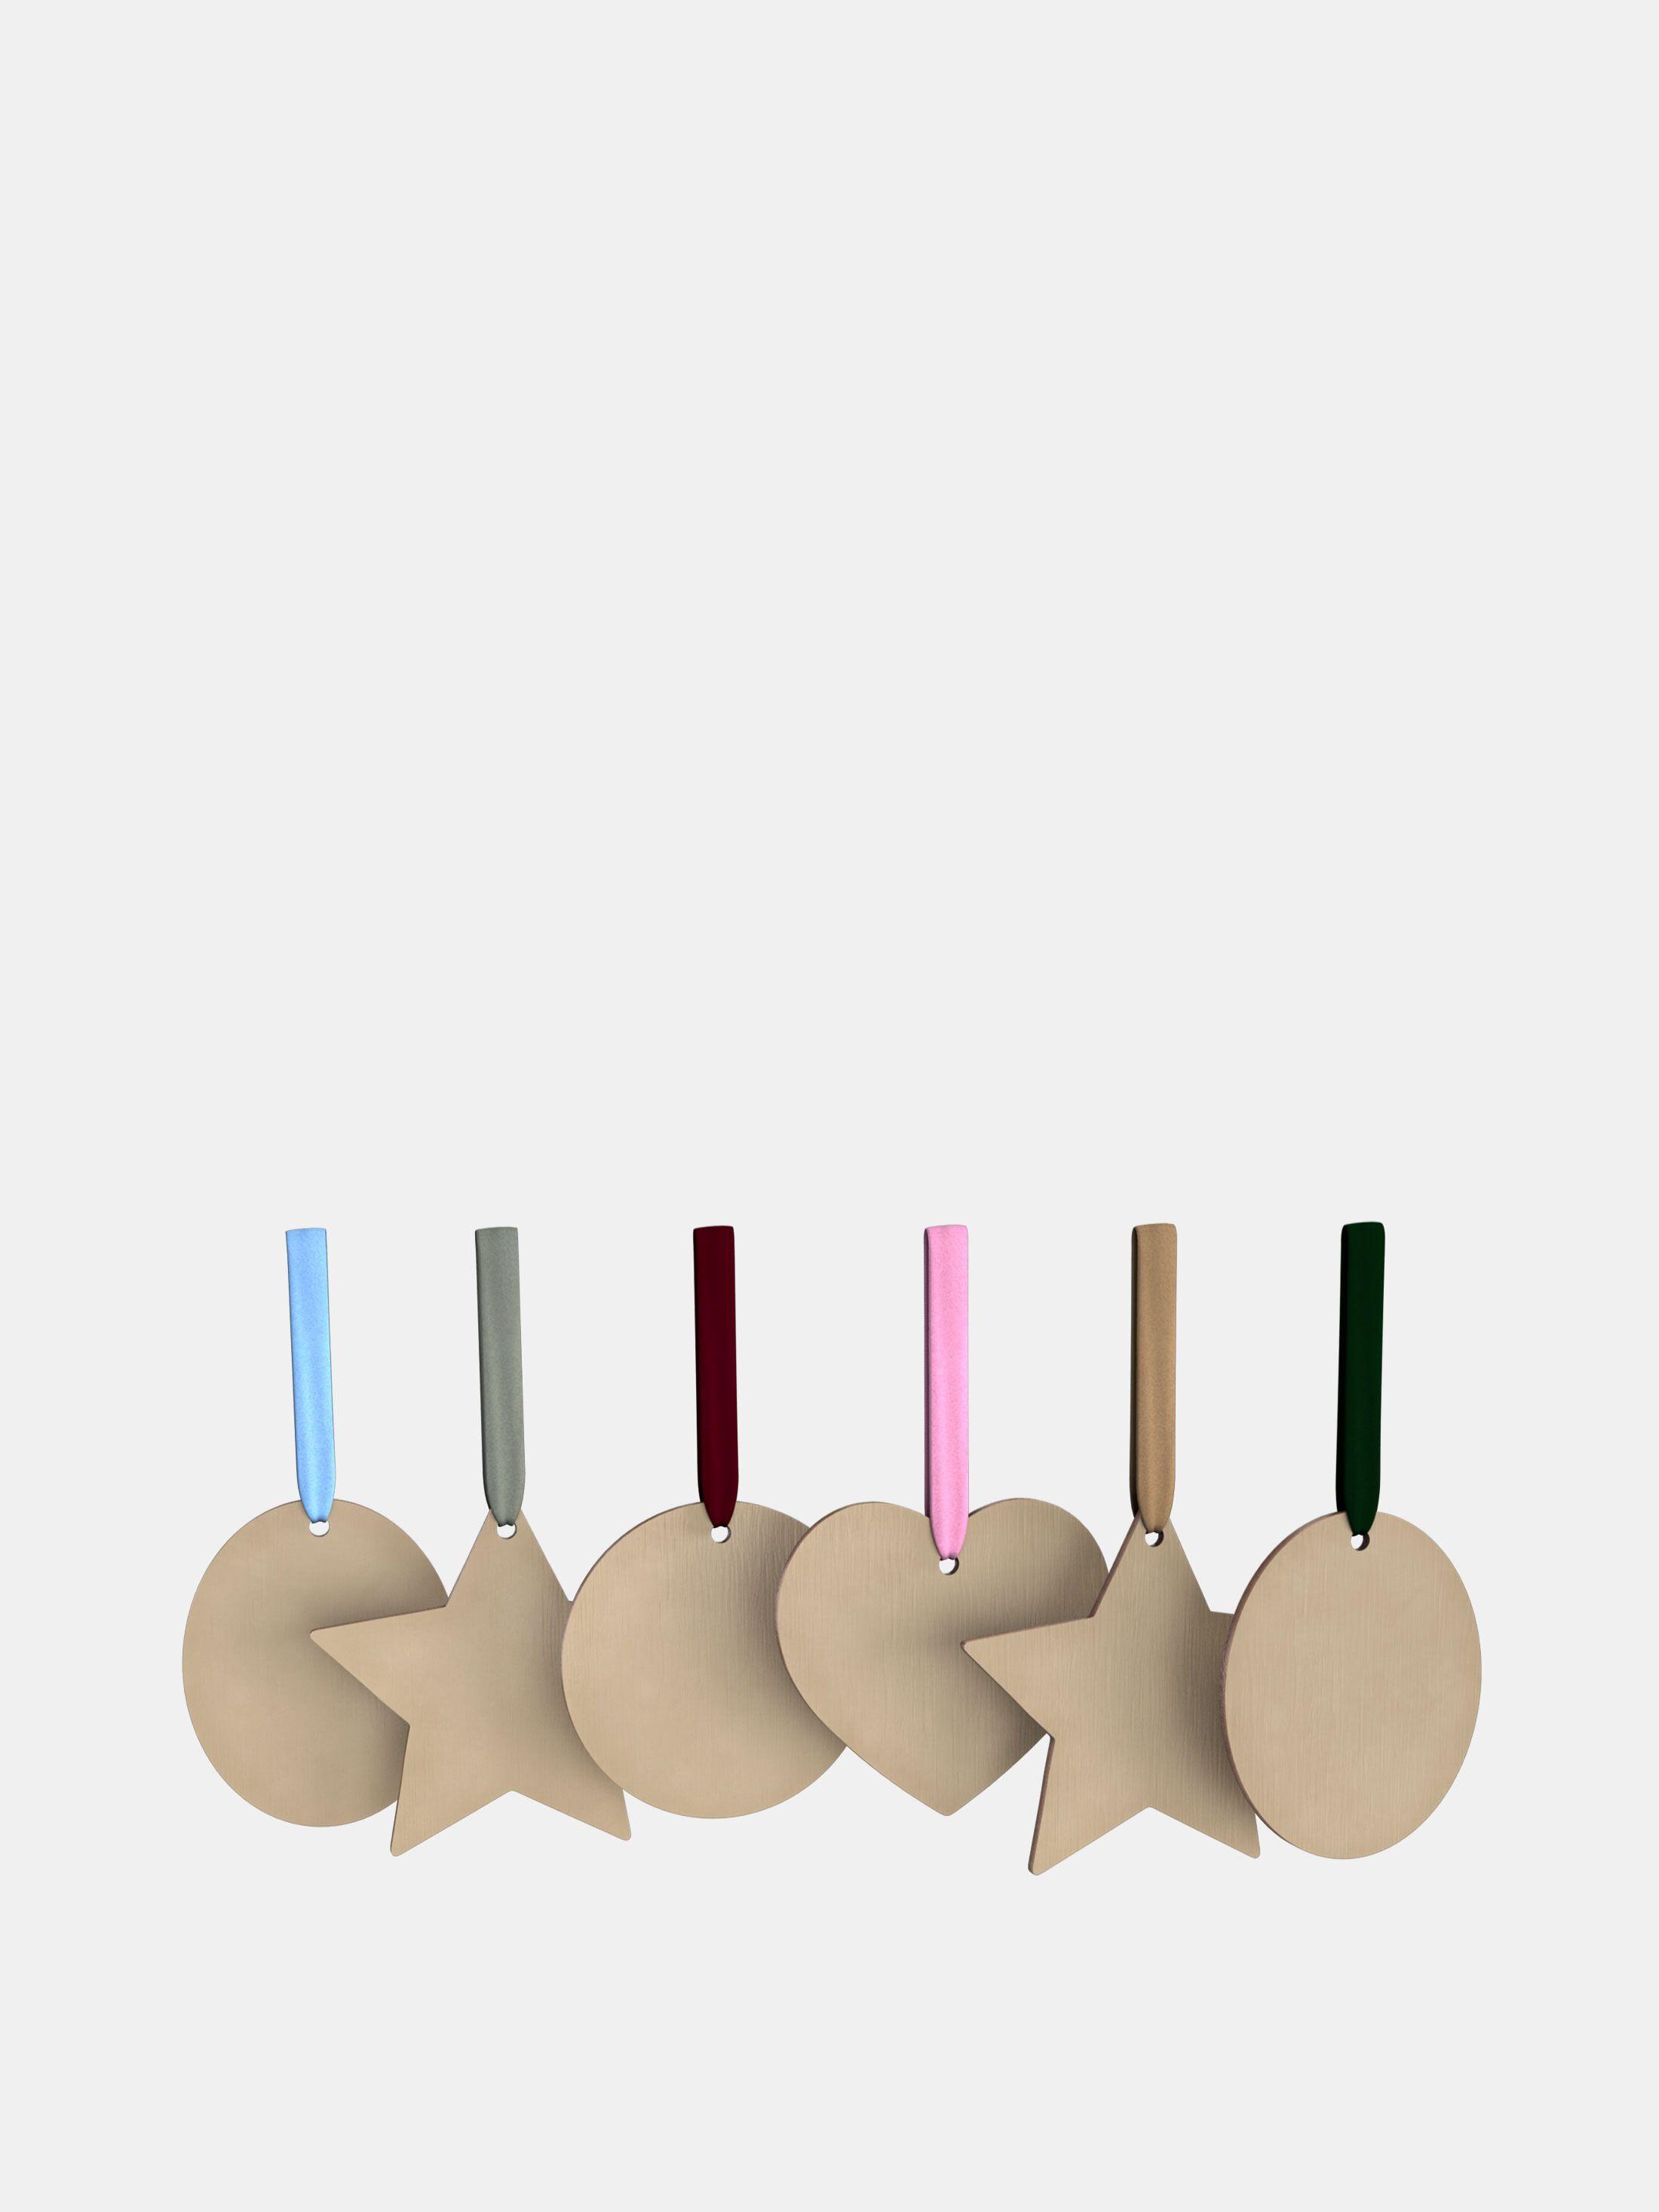 bedrukte houten kersthangers in vier vormen